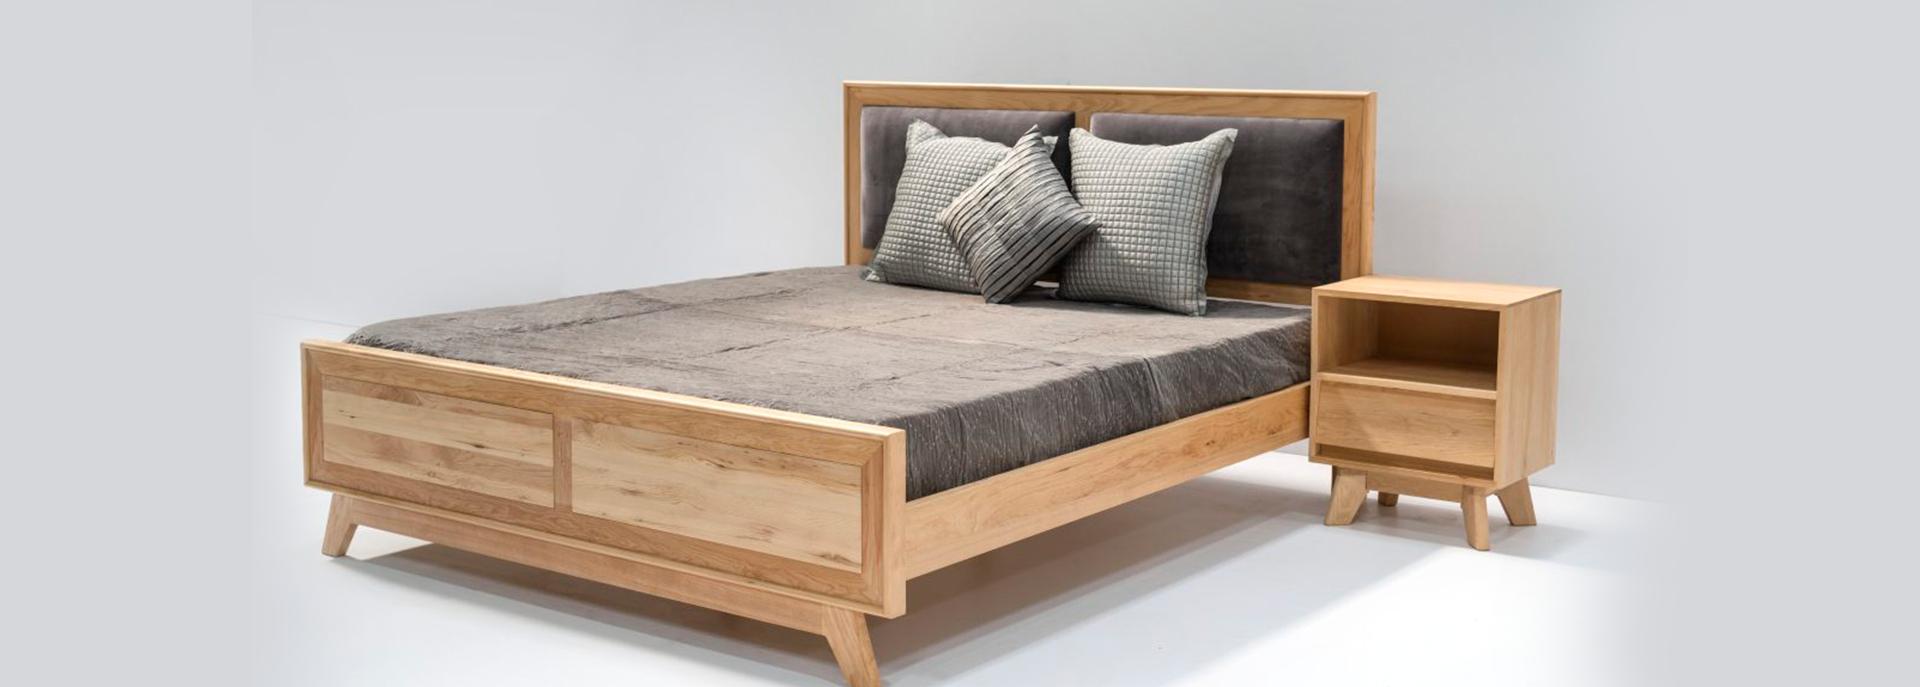 Application-Furniture